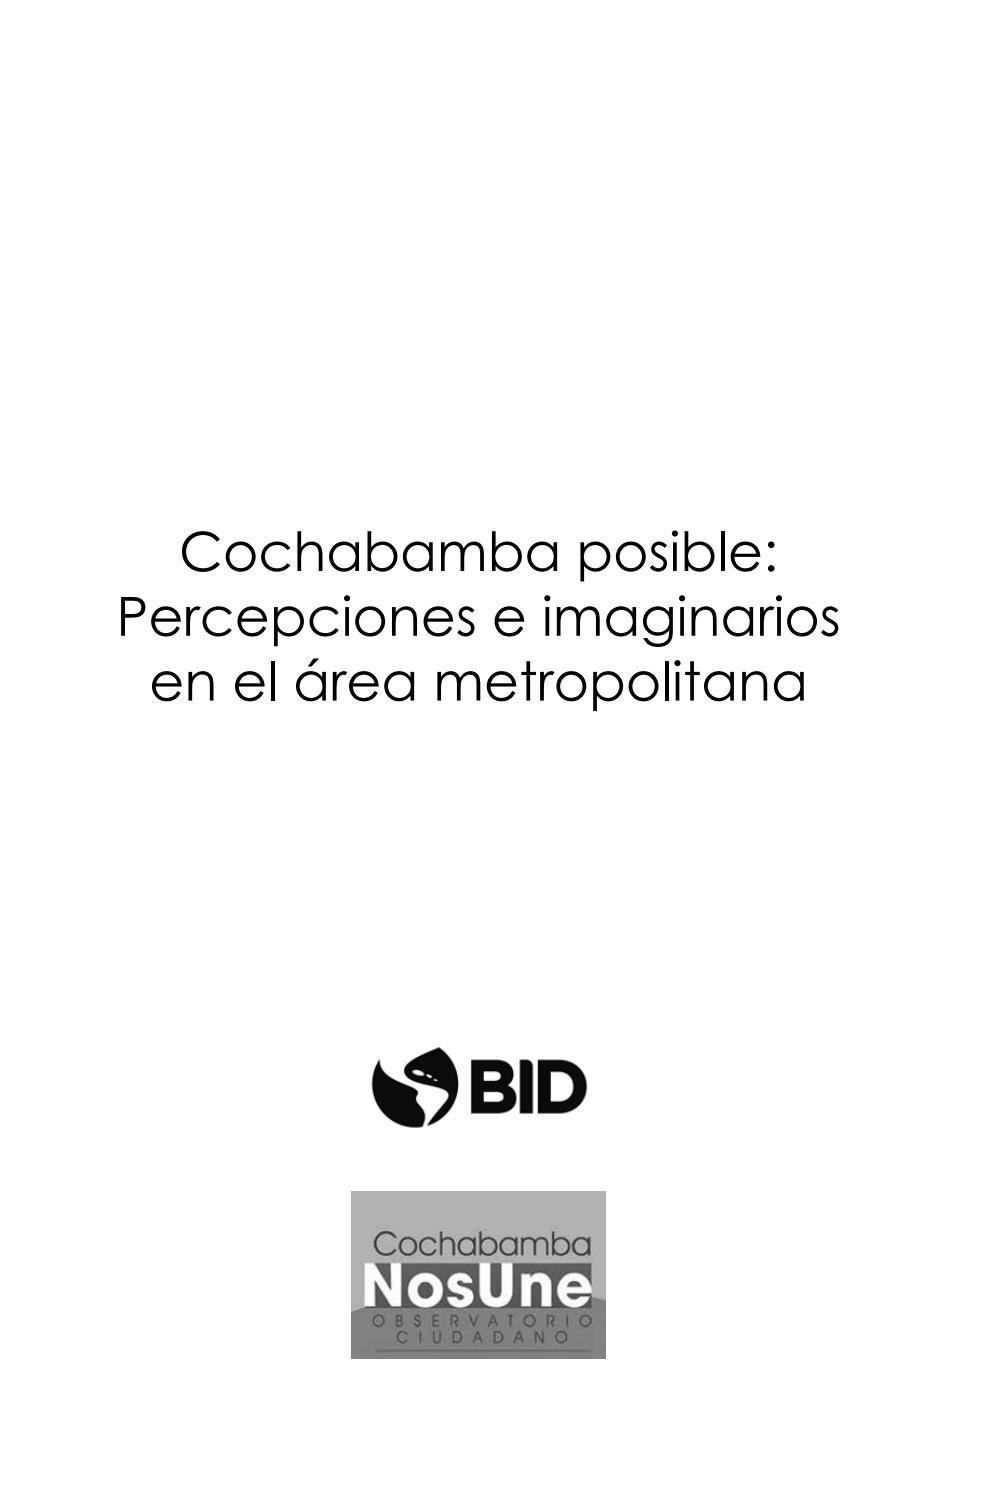 Conocer Chicas Cochabamba 690667